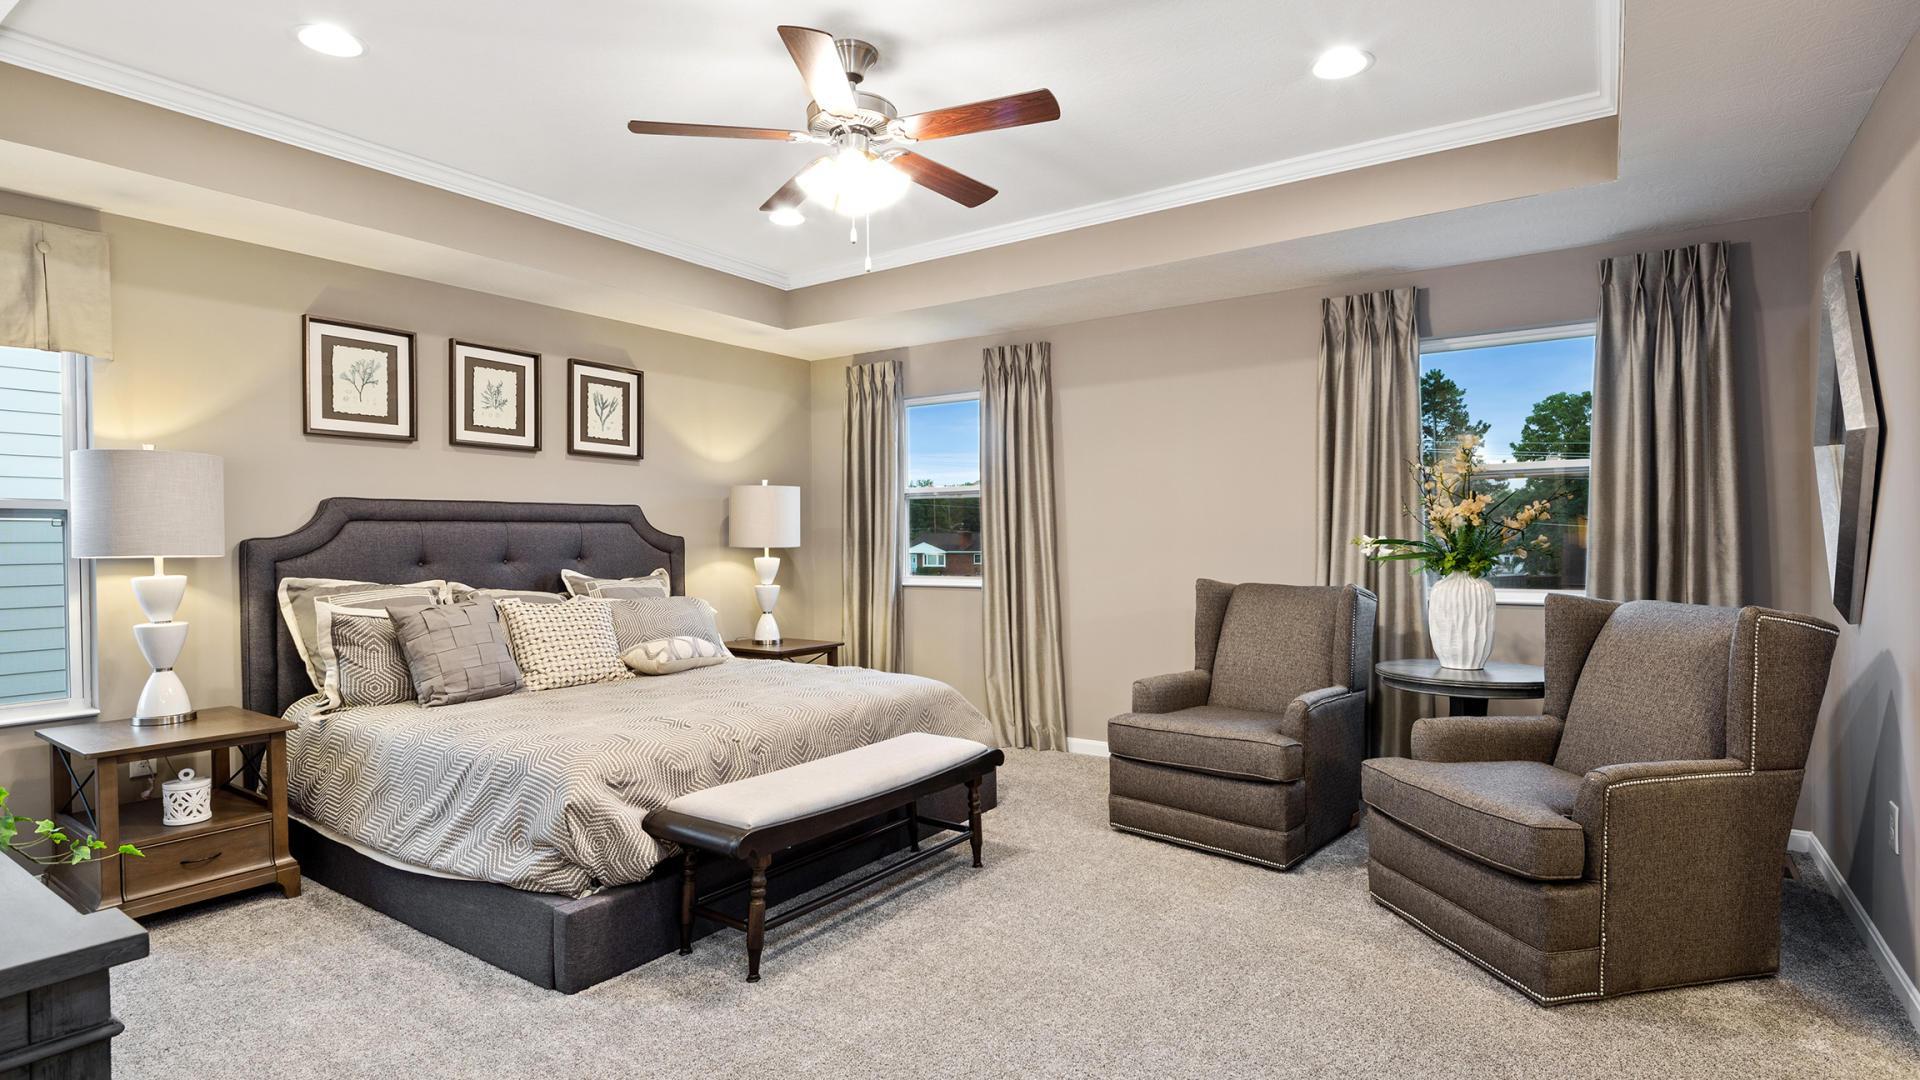 Bedroom featured in the Carlisle By Maronda Homes in Cincinnati, KY